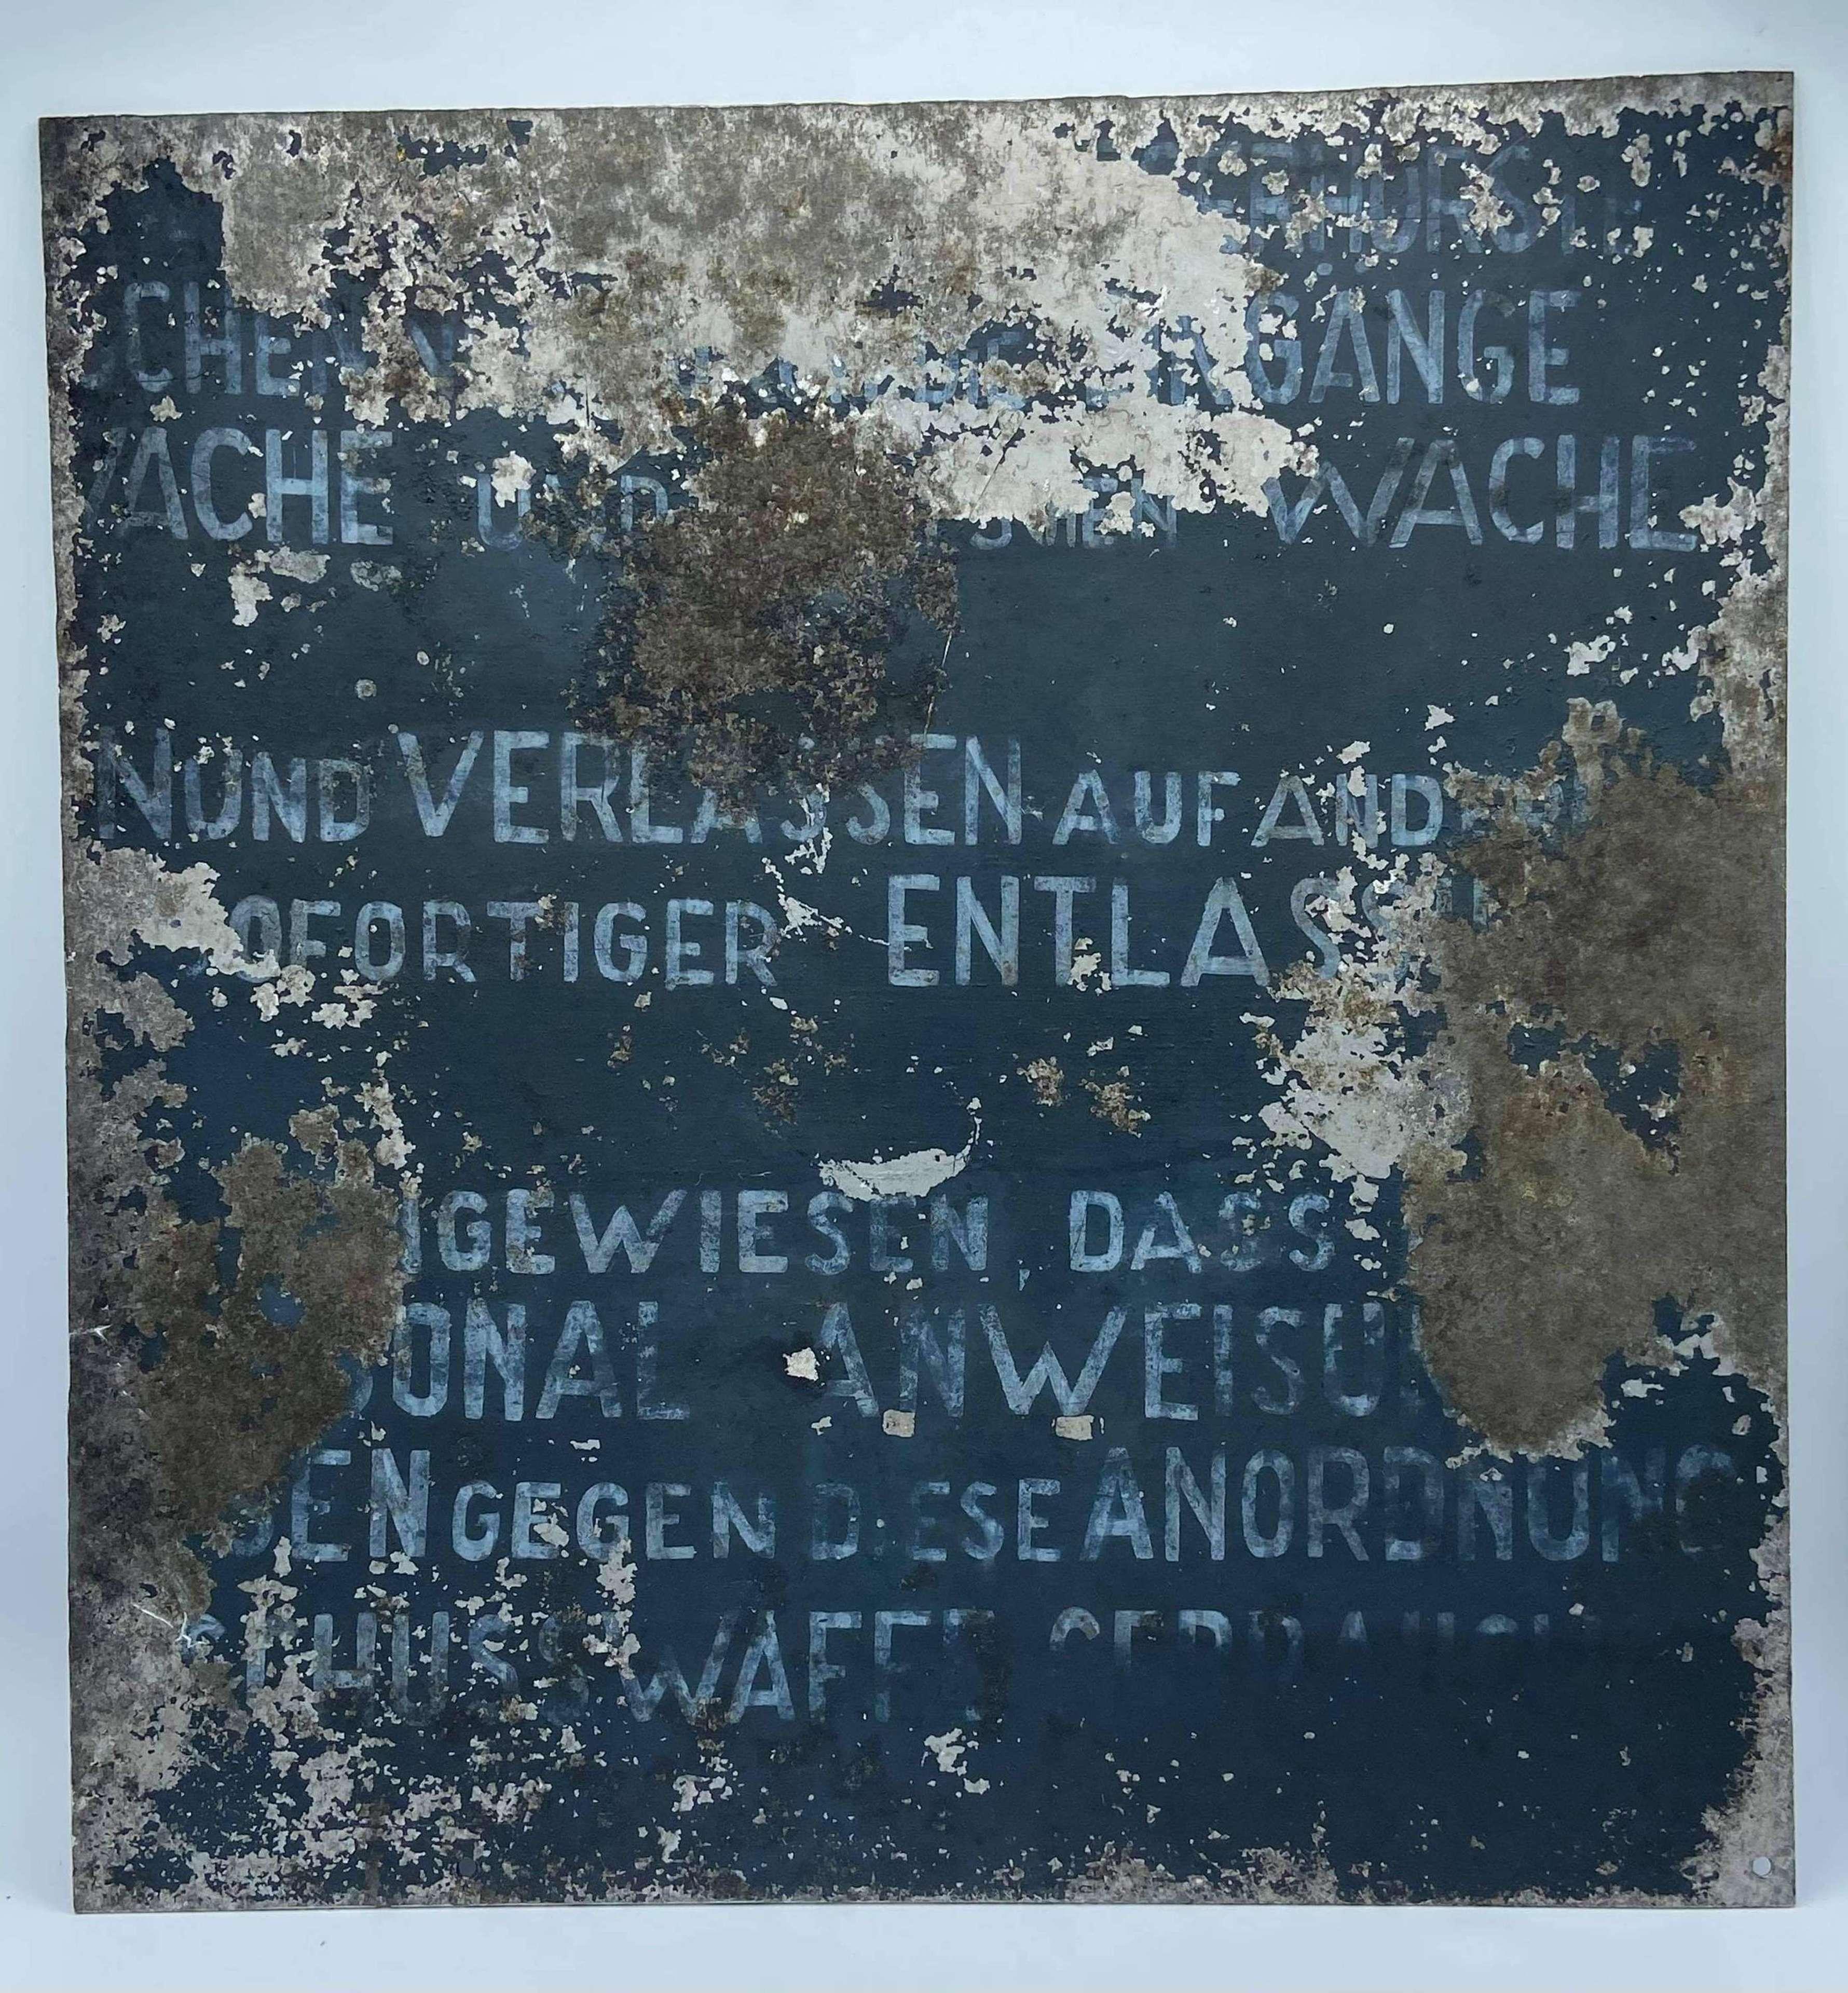 Vintage 1970s Berlin Wall Guard Tower Warning Shoot On Sight Sign